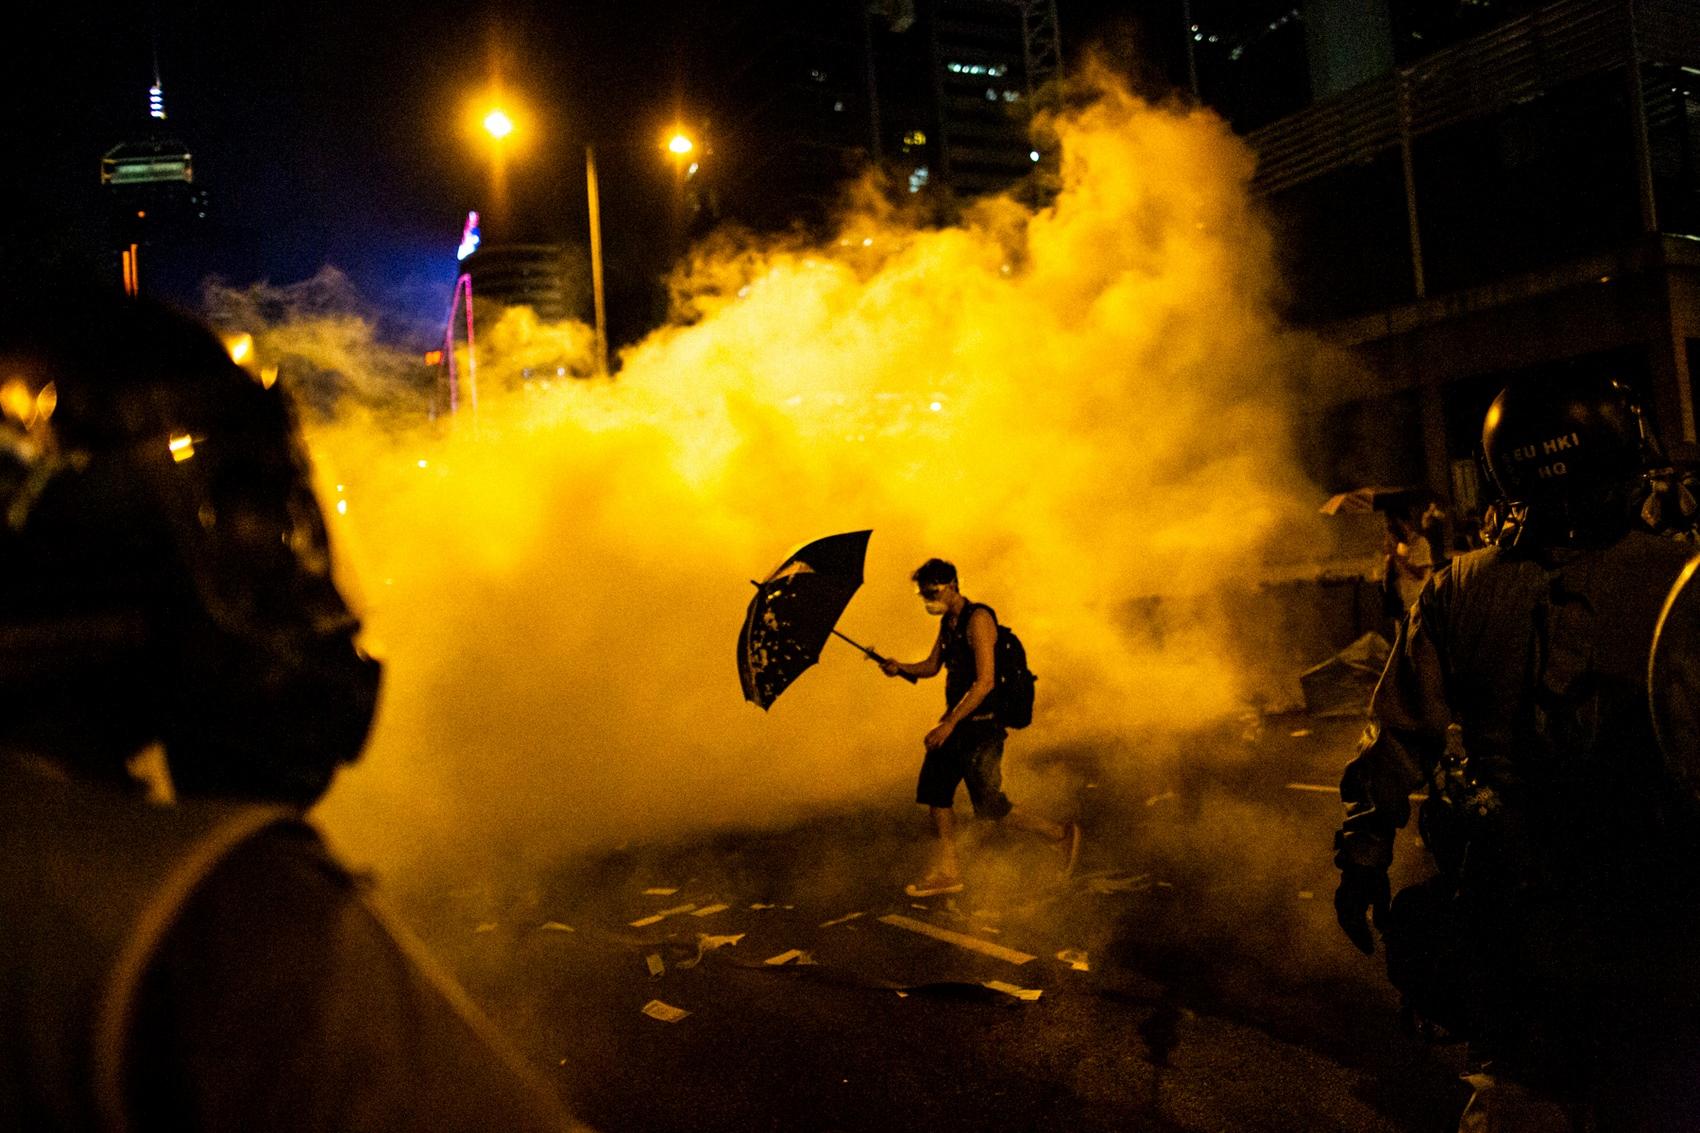 11_todd-r-sayang-dokumenter-fotografer-hong-kong-umbrella-movement-demokrasi-protes-hak asasi manusia (Salinan)